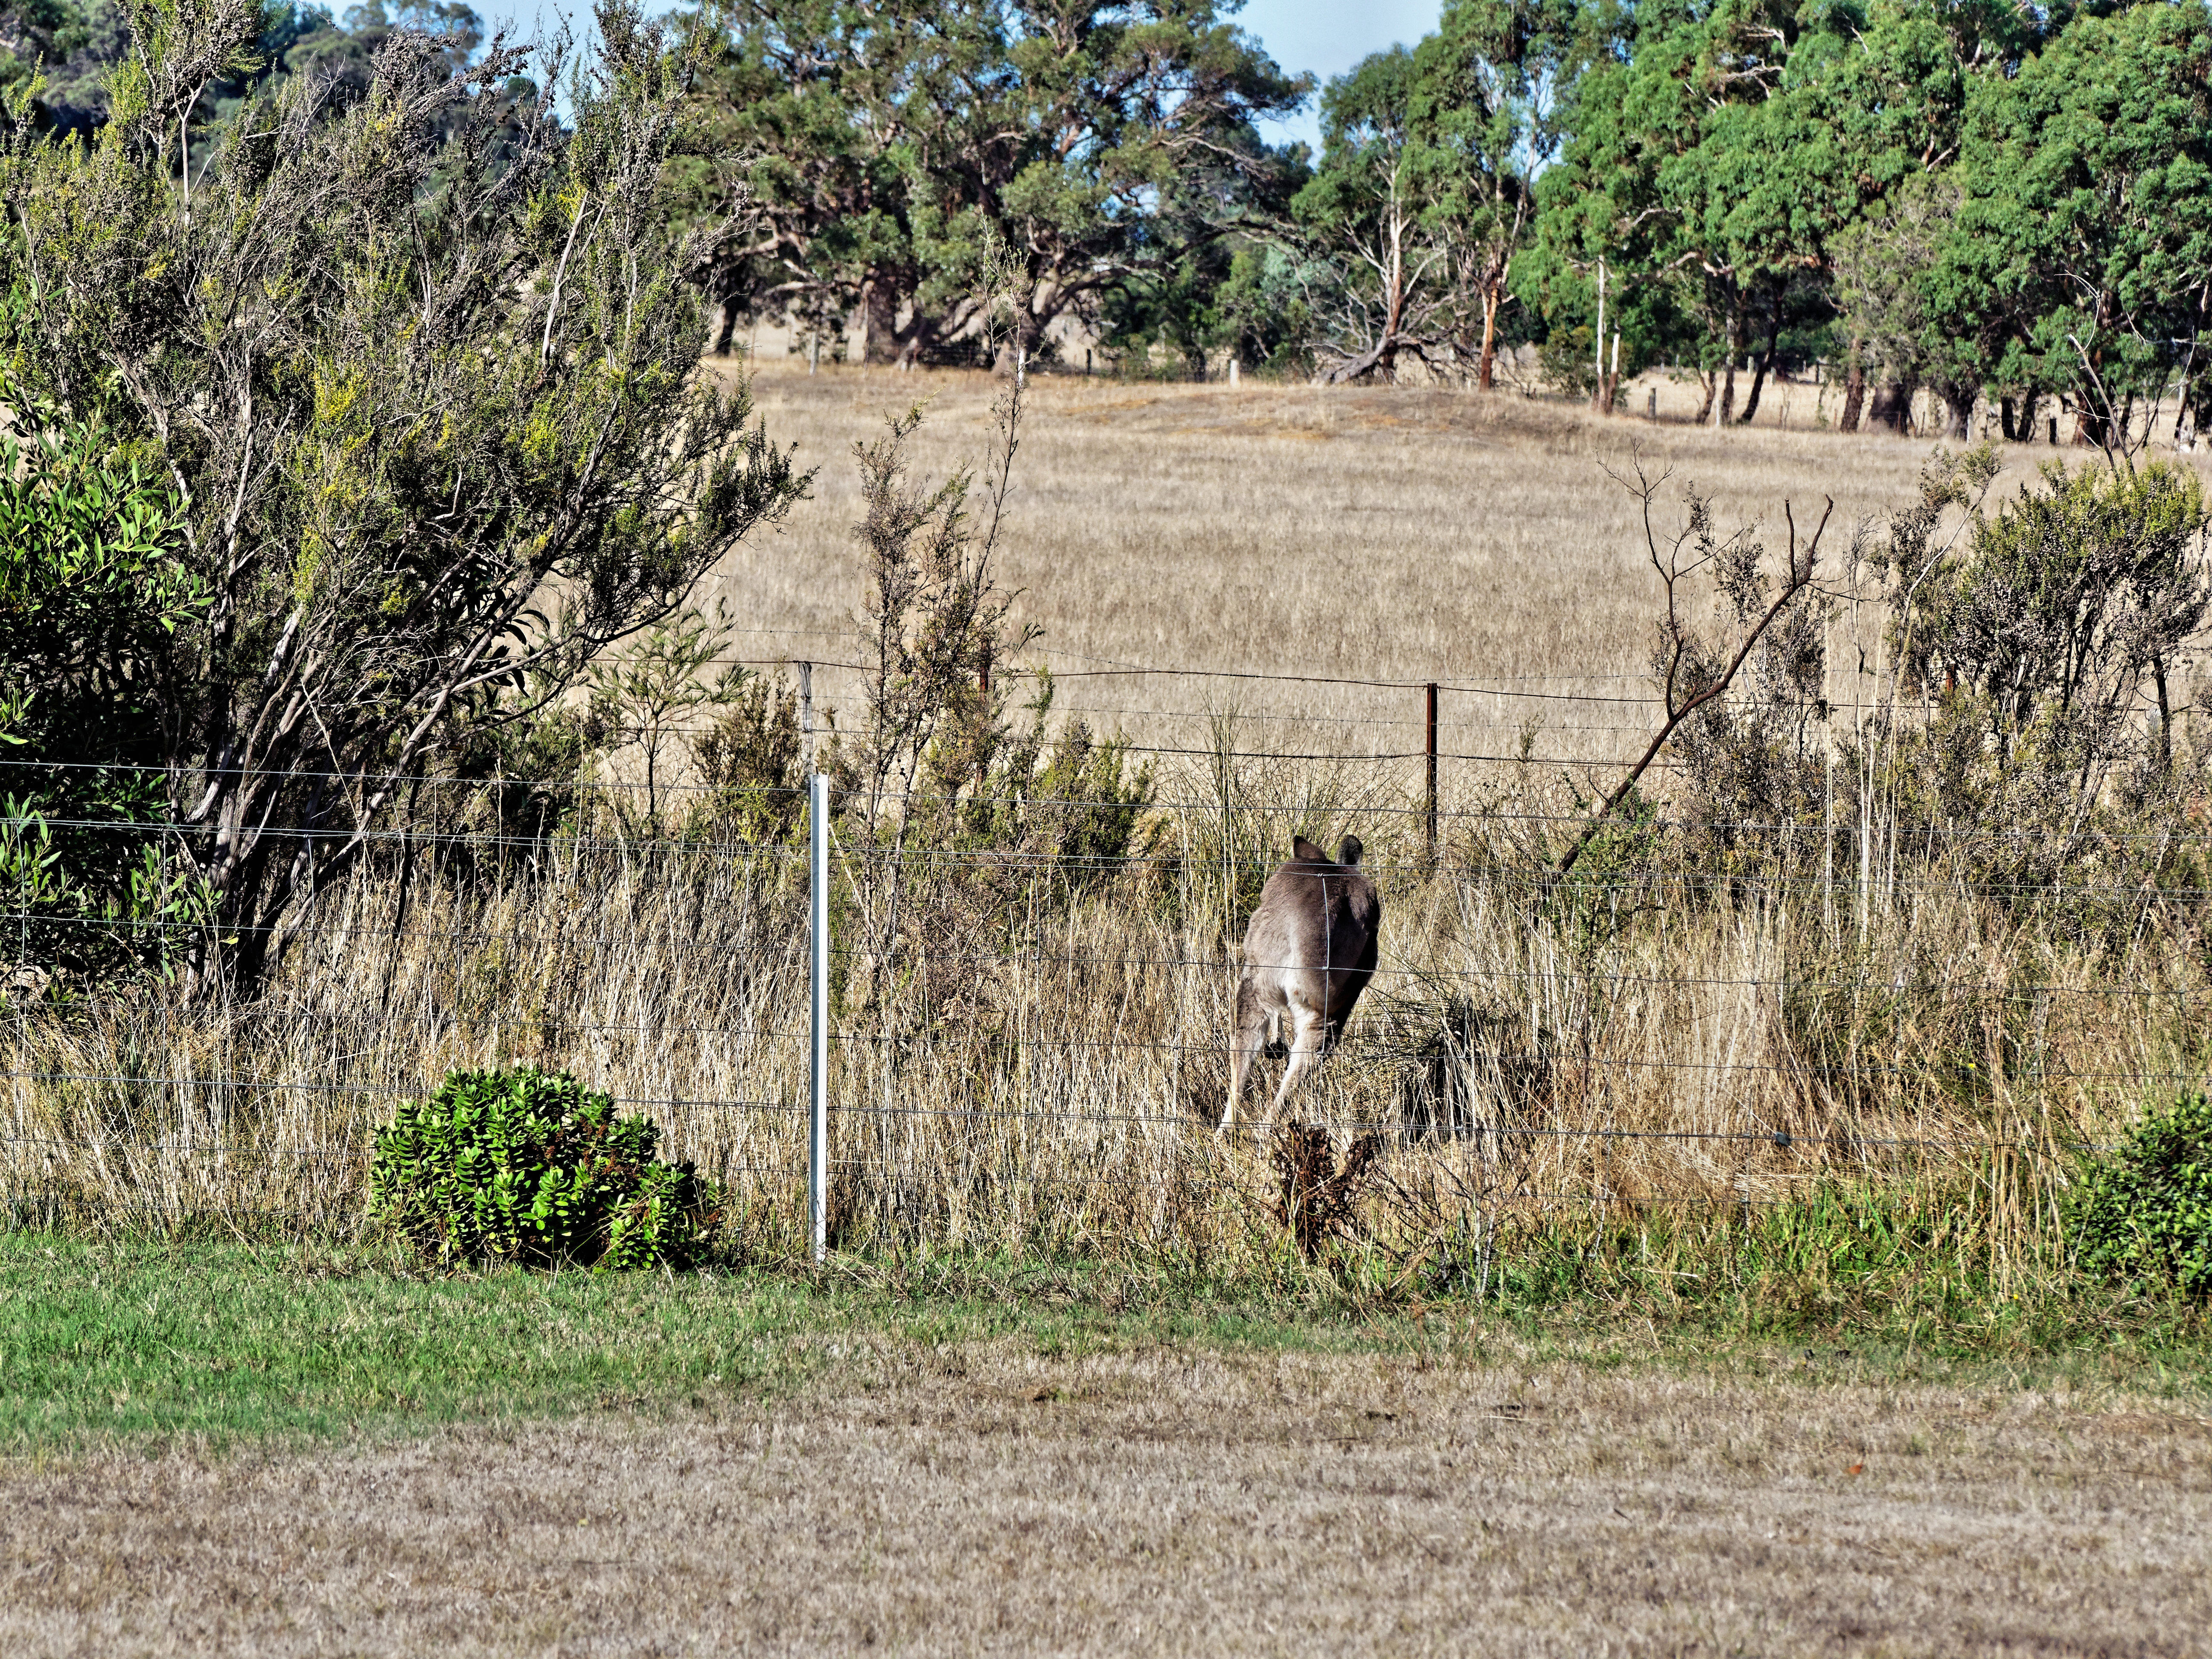 Kangaroo-17.jpeg